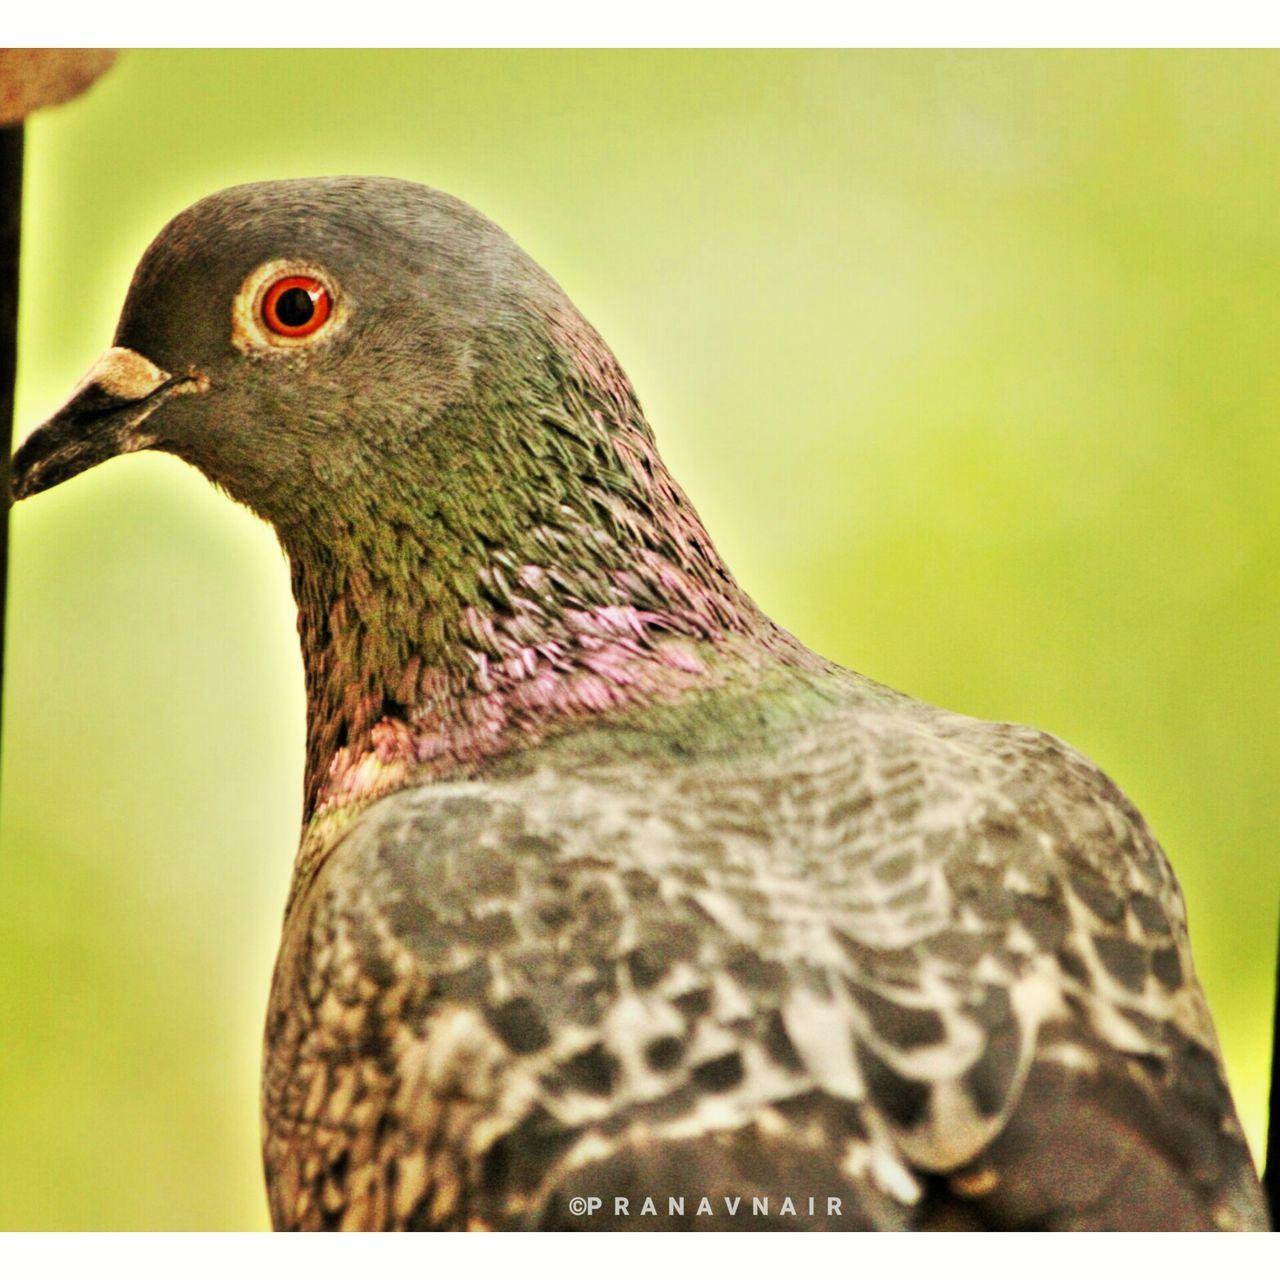 Bird No People Nature Day Beak Close-up Pigeon Pigeon Bird  India Likemypics Followme